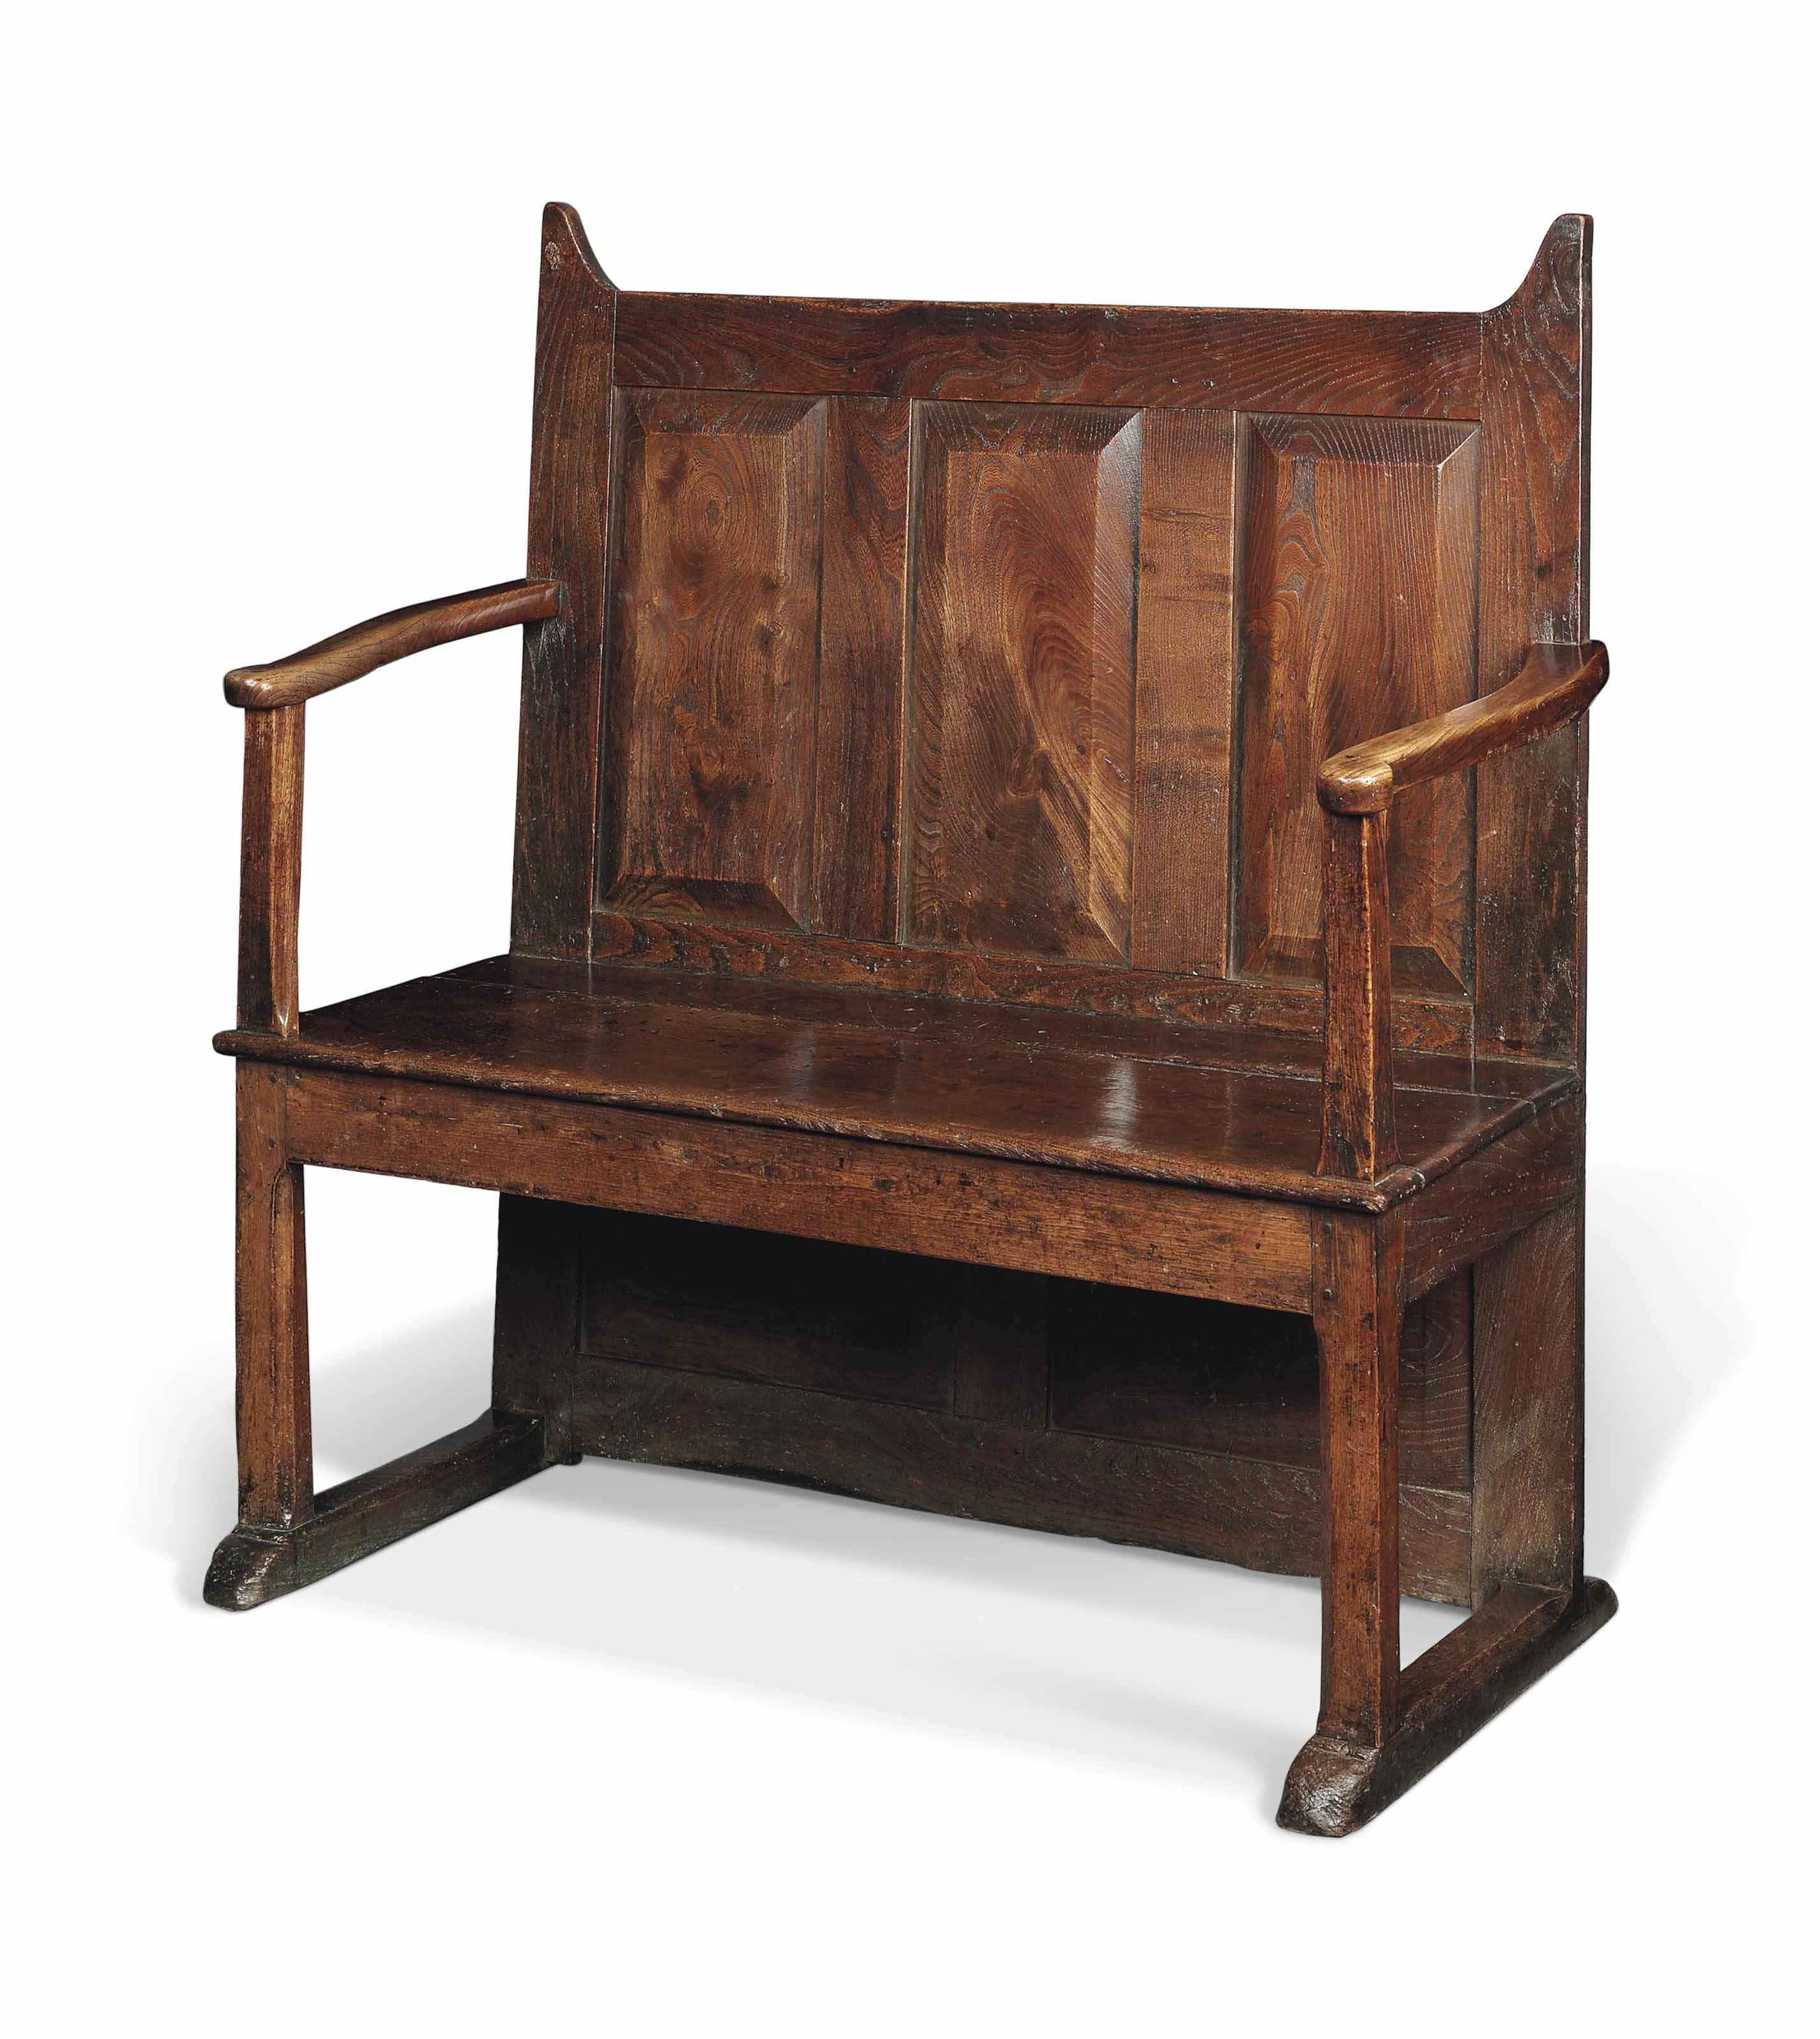 Enjoyable A Small George Iii Elm Settle Late 18Th Century Welsh Beatyapartments Chair Design Images Beatyapartmentscom